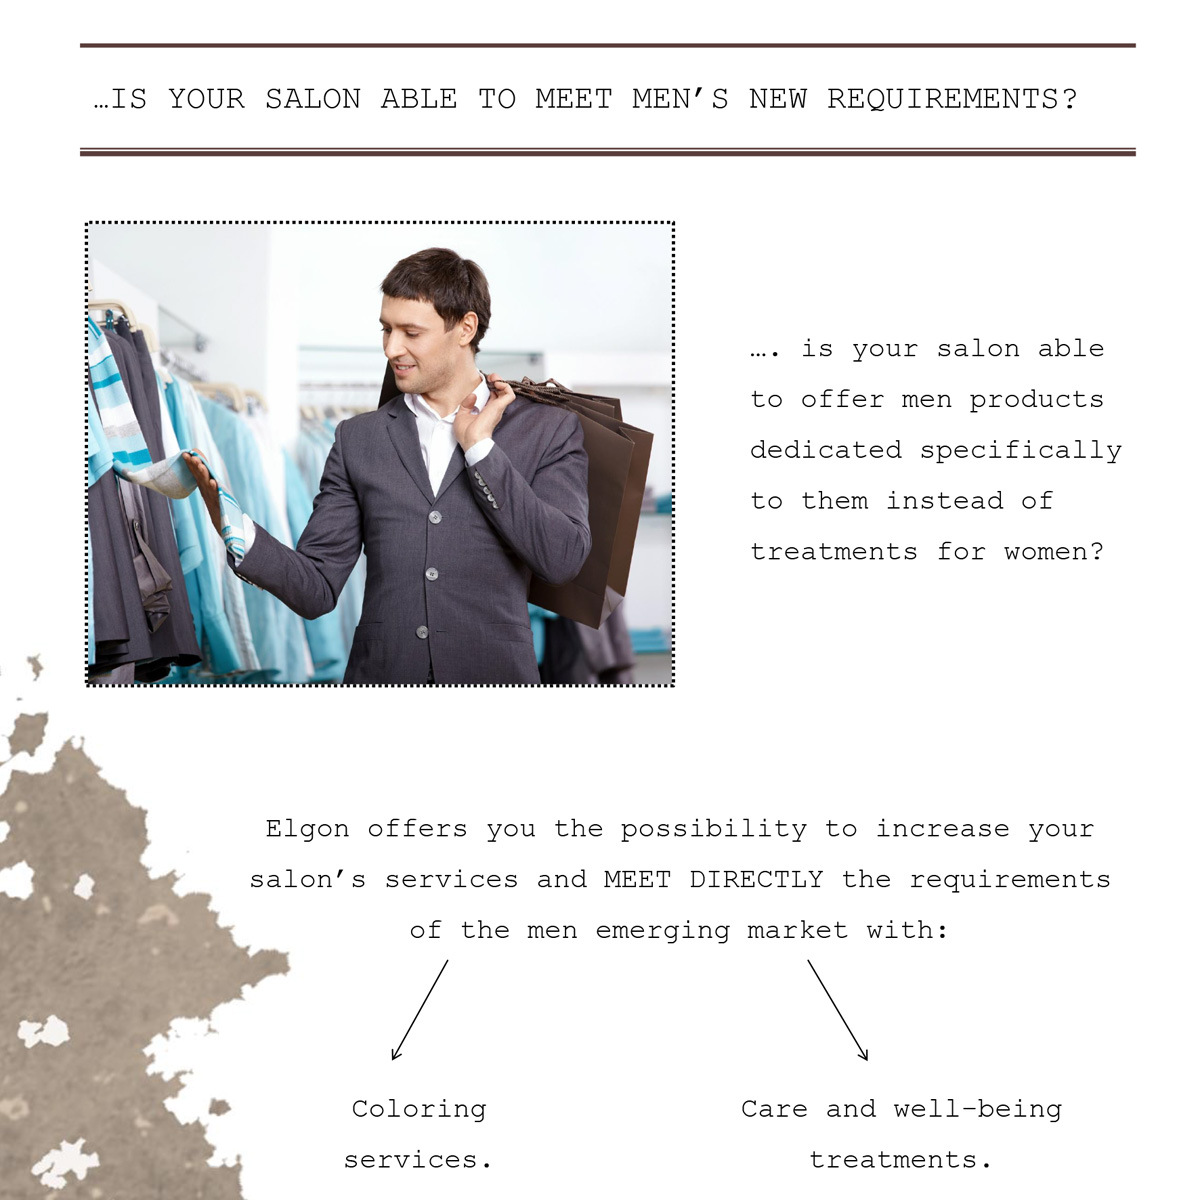 Elgon Man Presentation-3.jpg